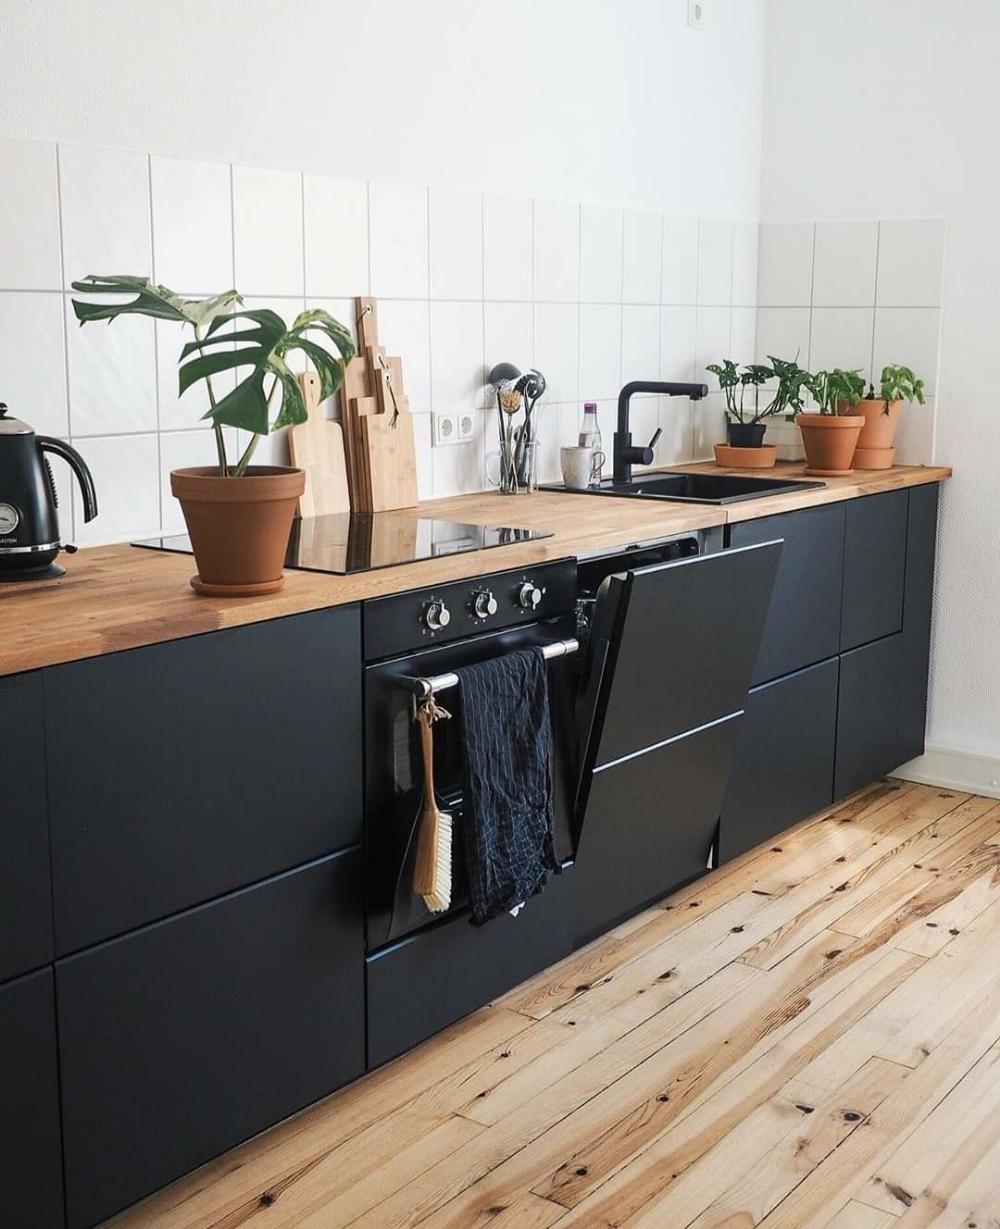 Black Cabinetry Kitchen Inspiration Homeaura Kitchens Without Upper Cabinets Kitchen Interior Kitchen Design